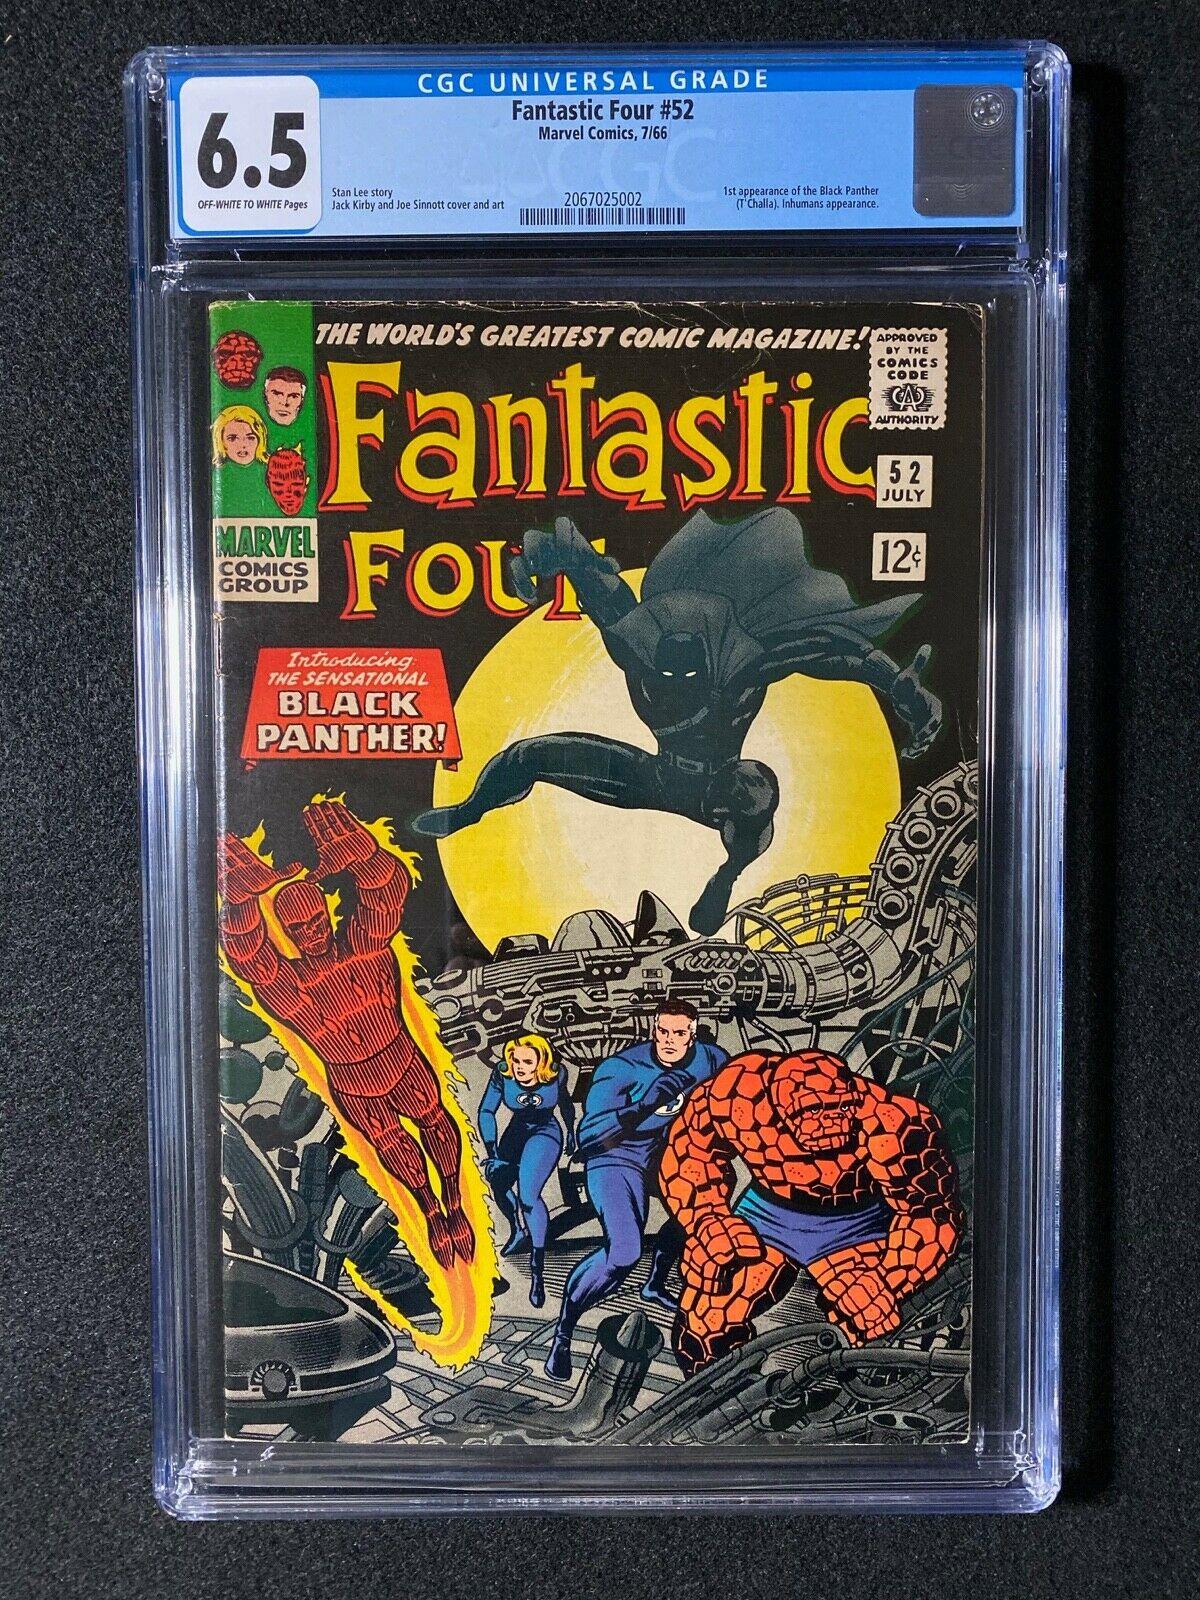 Fantastic Four #52 CGC 6.5 (1966) - 1st app of the Black Panter